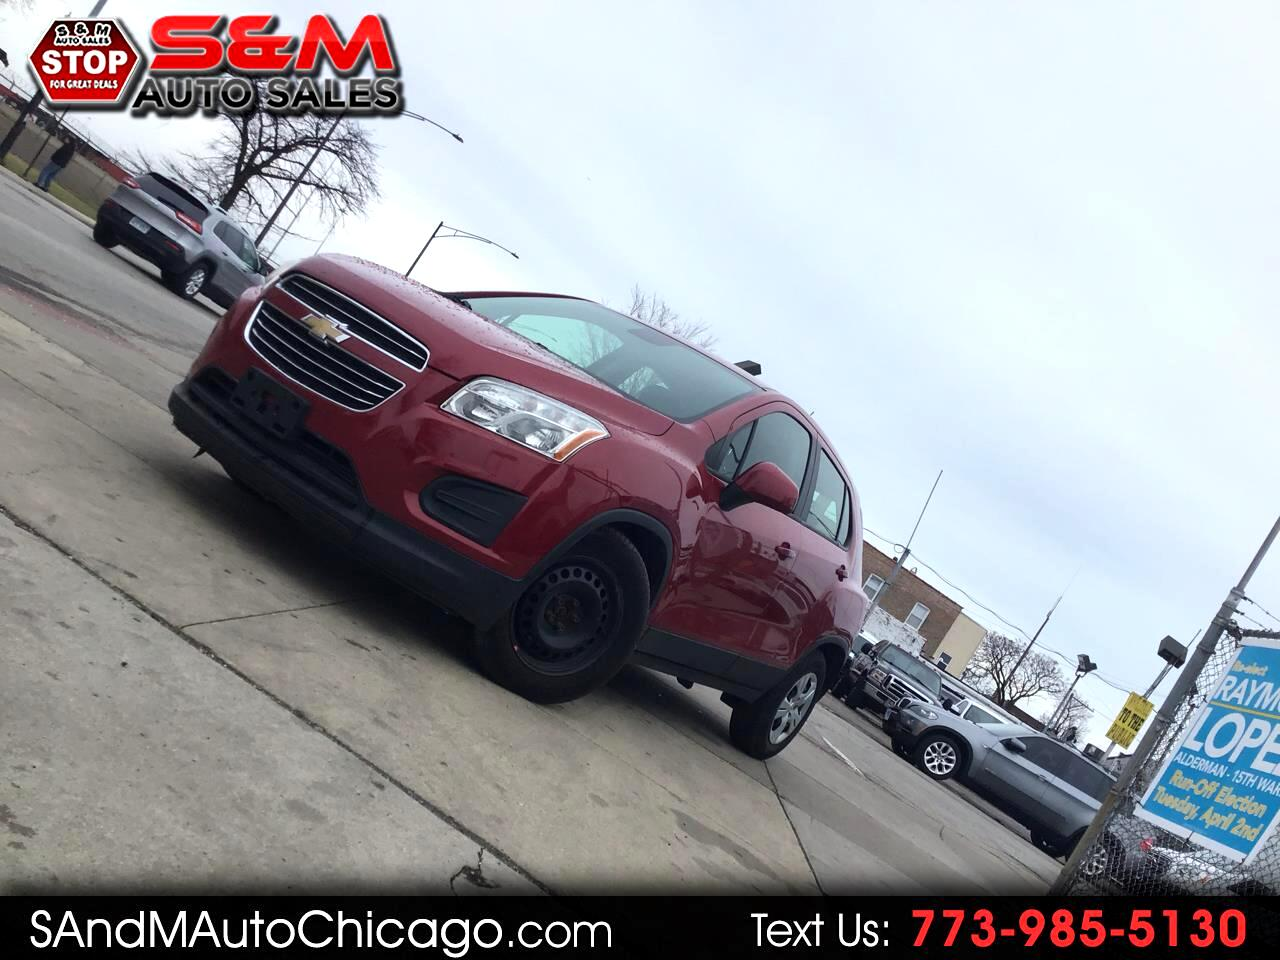 2015 Chevrolet Trax FWD 4dr LS w/1LS